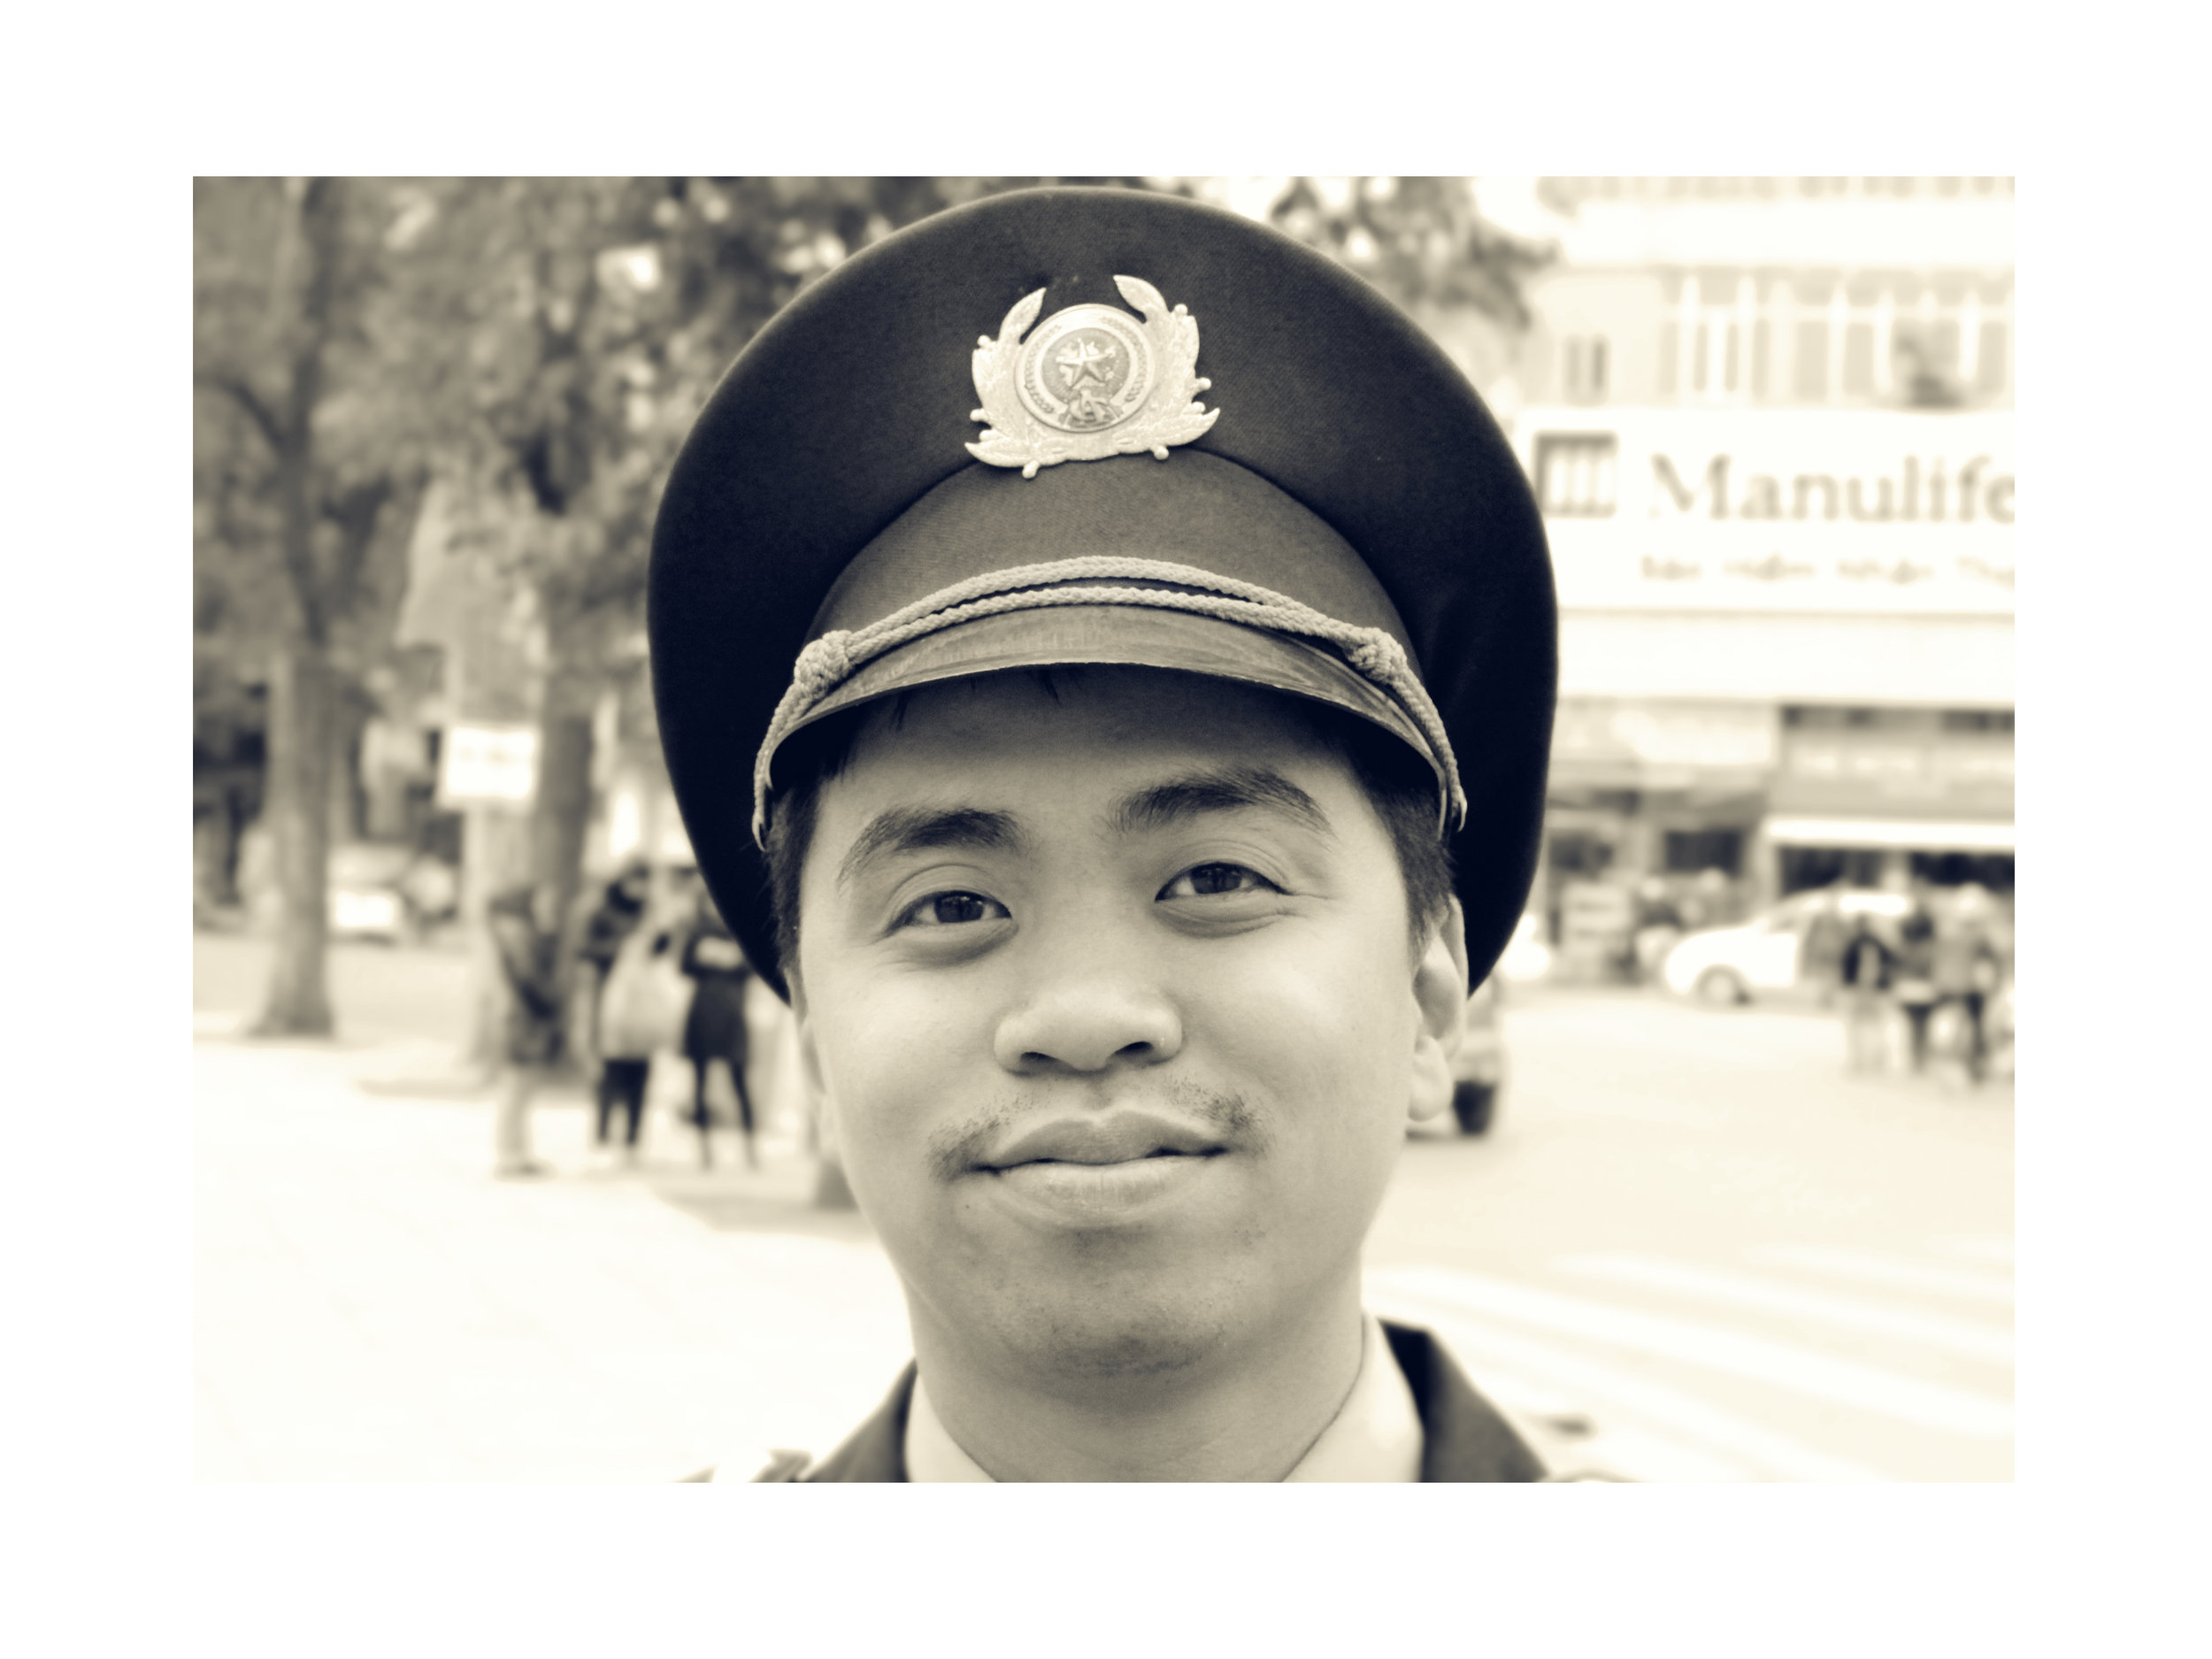 JW_face VI_027.jpg